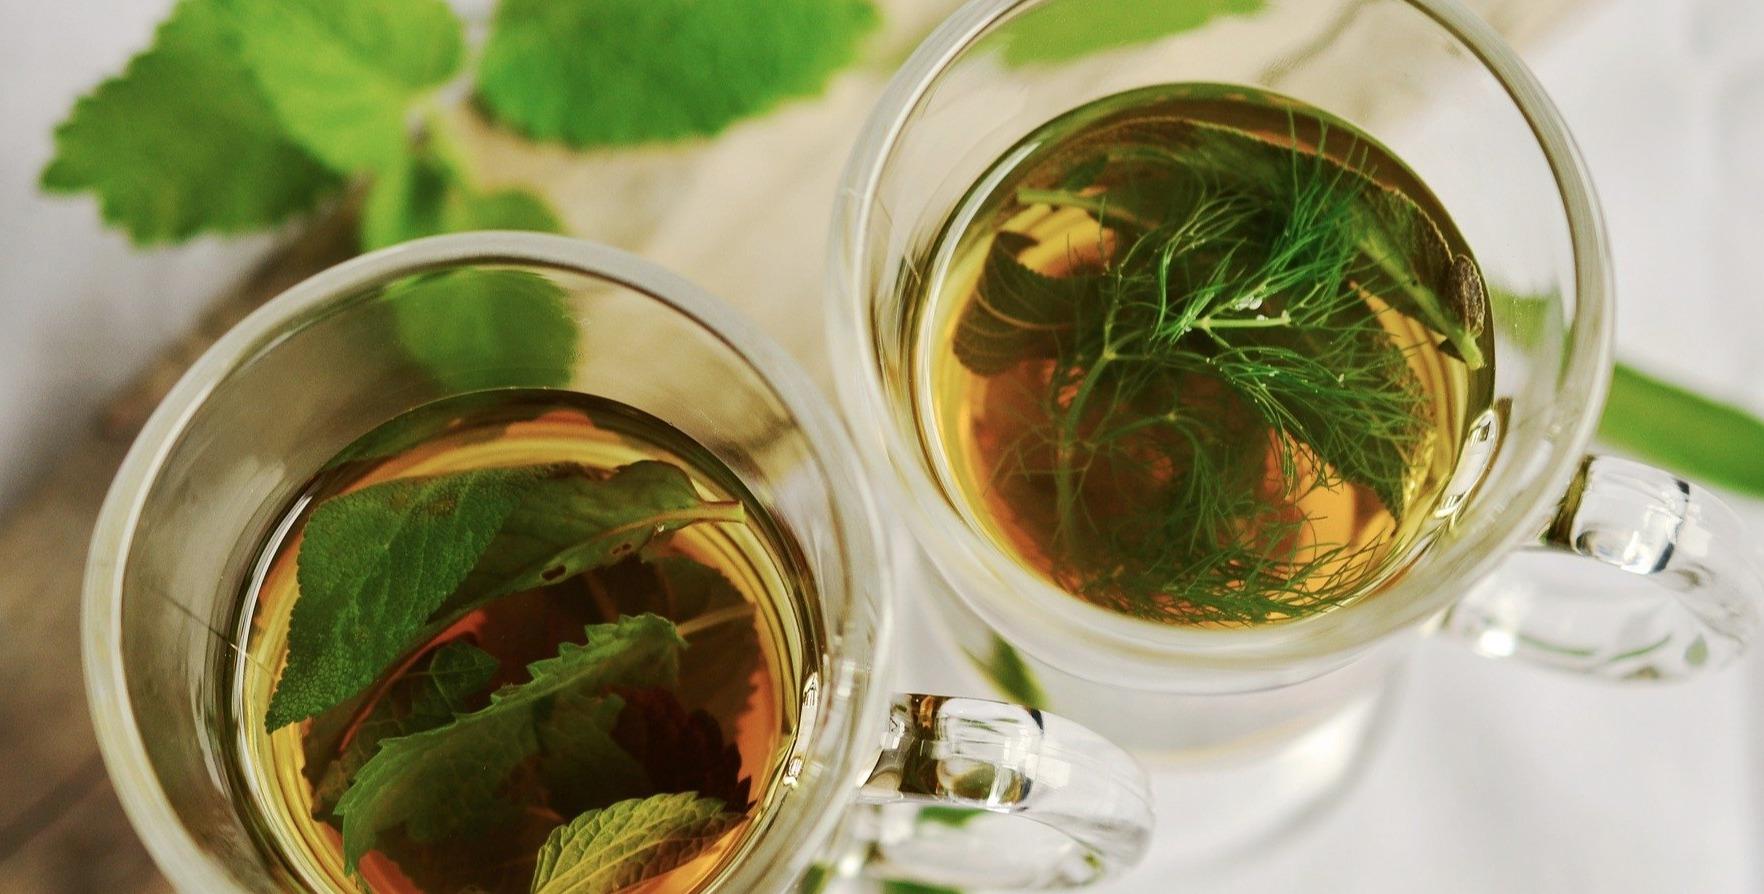 Herbal teas in glass mugs